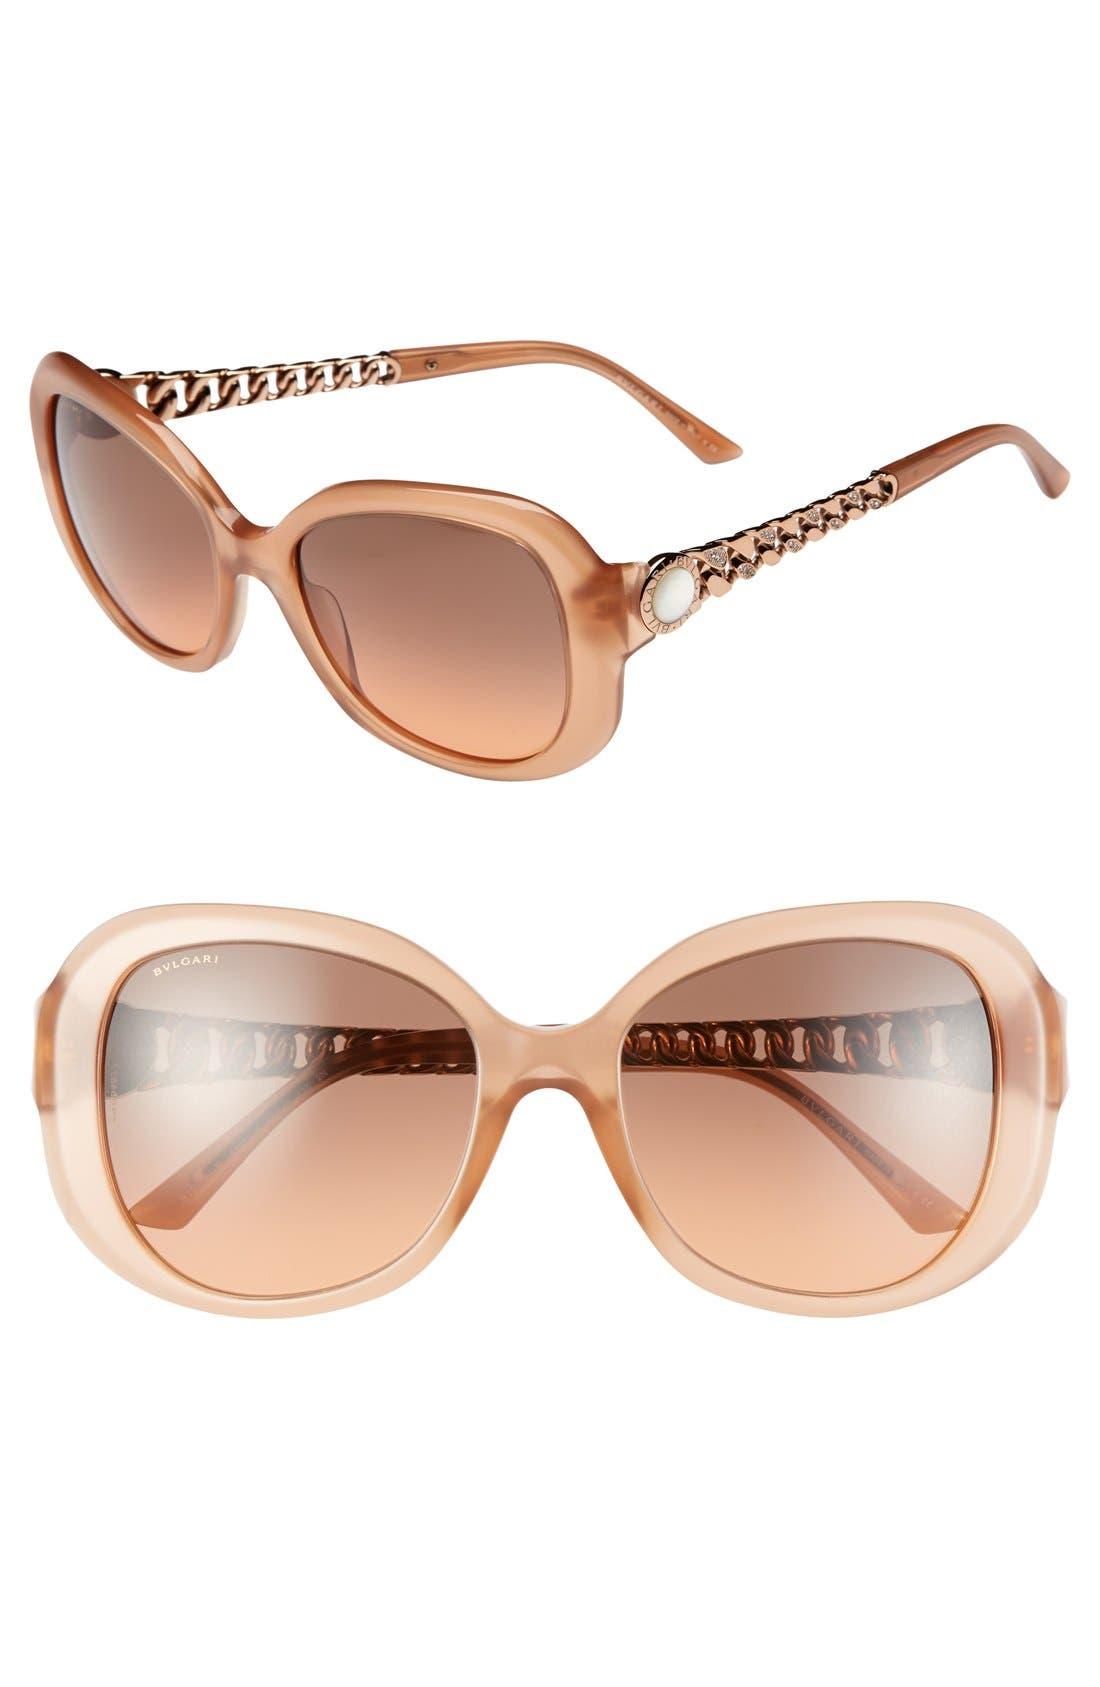 Alternate Image 1 Selected - BVLGARI 56mm Oversized Sunglasses